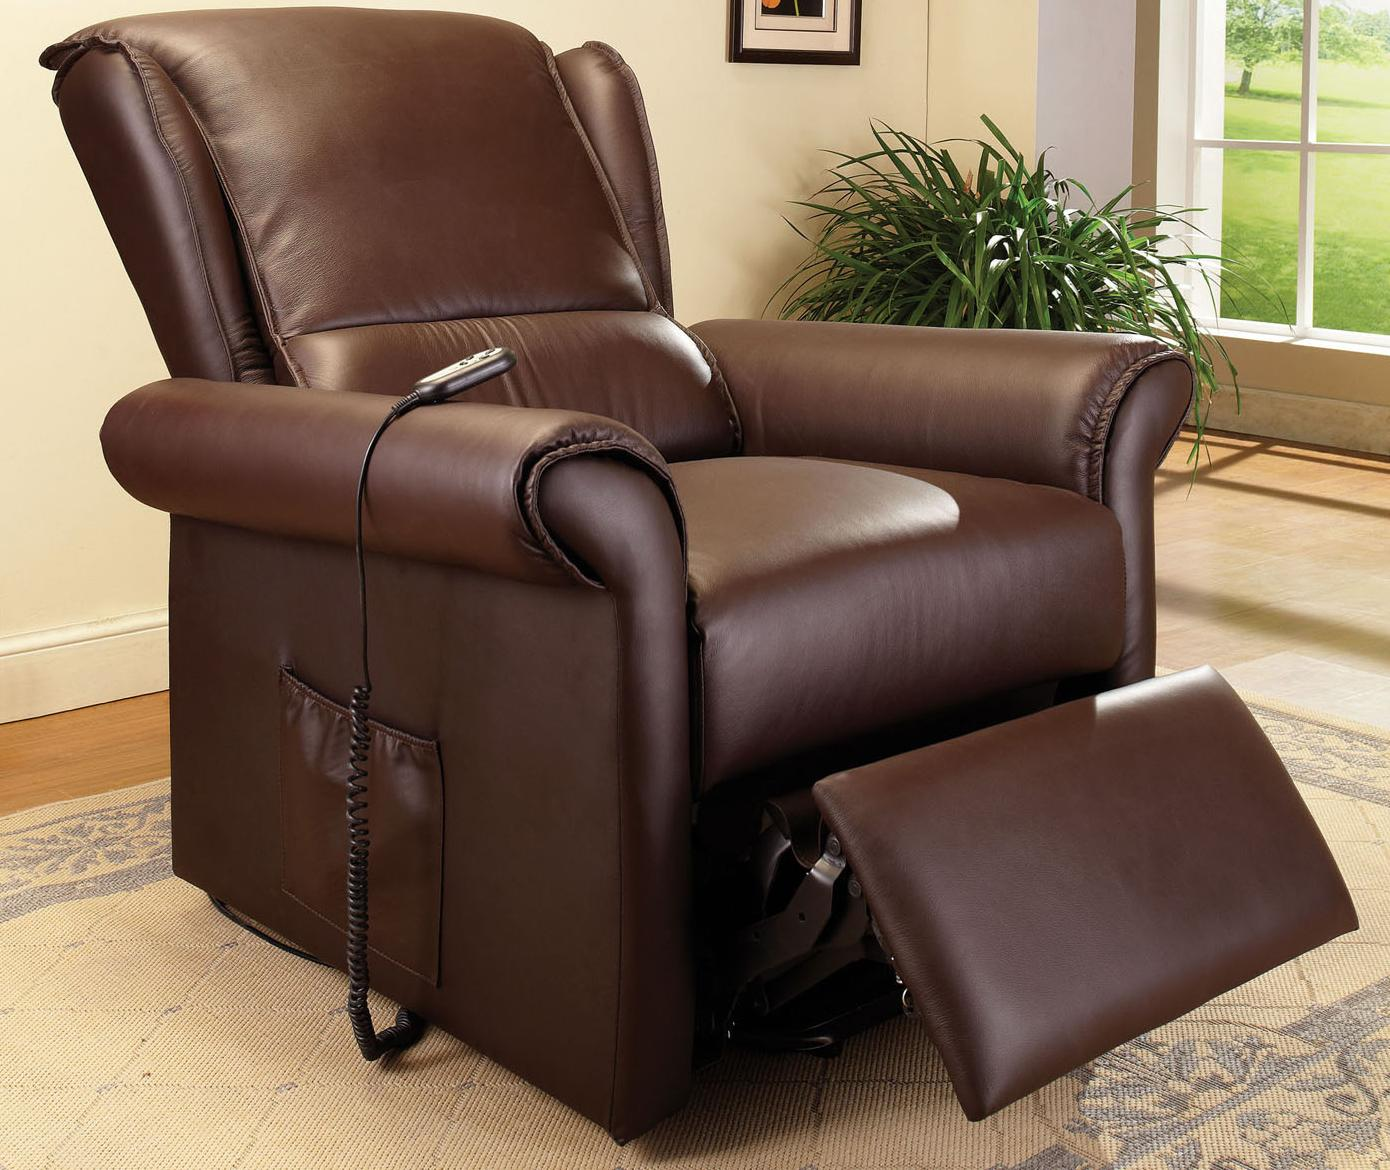 Acme Furniture Emari Dark Br Pu Electric Lift Recliner Seat - Item Number: 59169